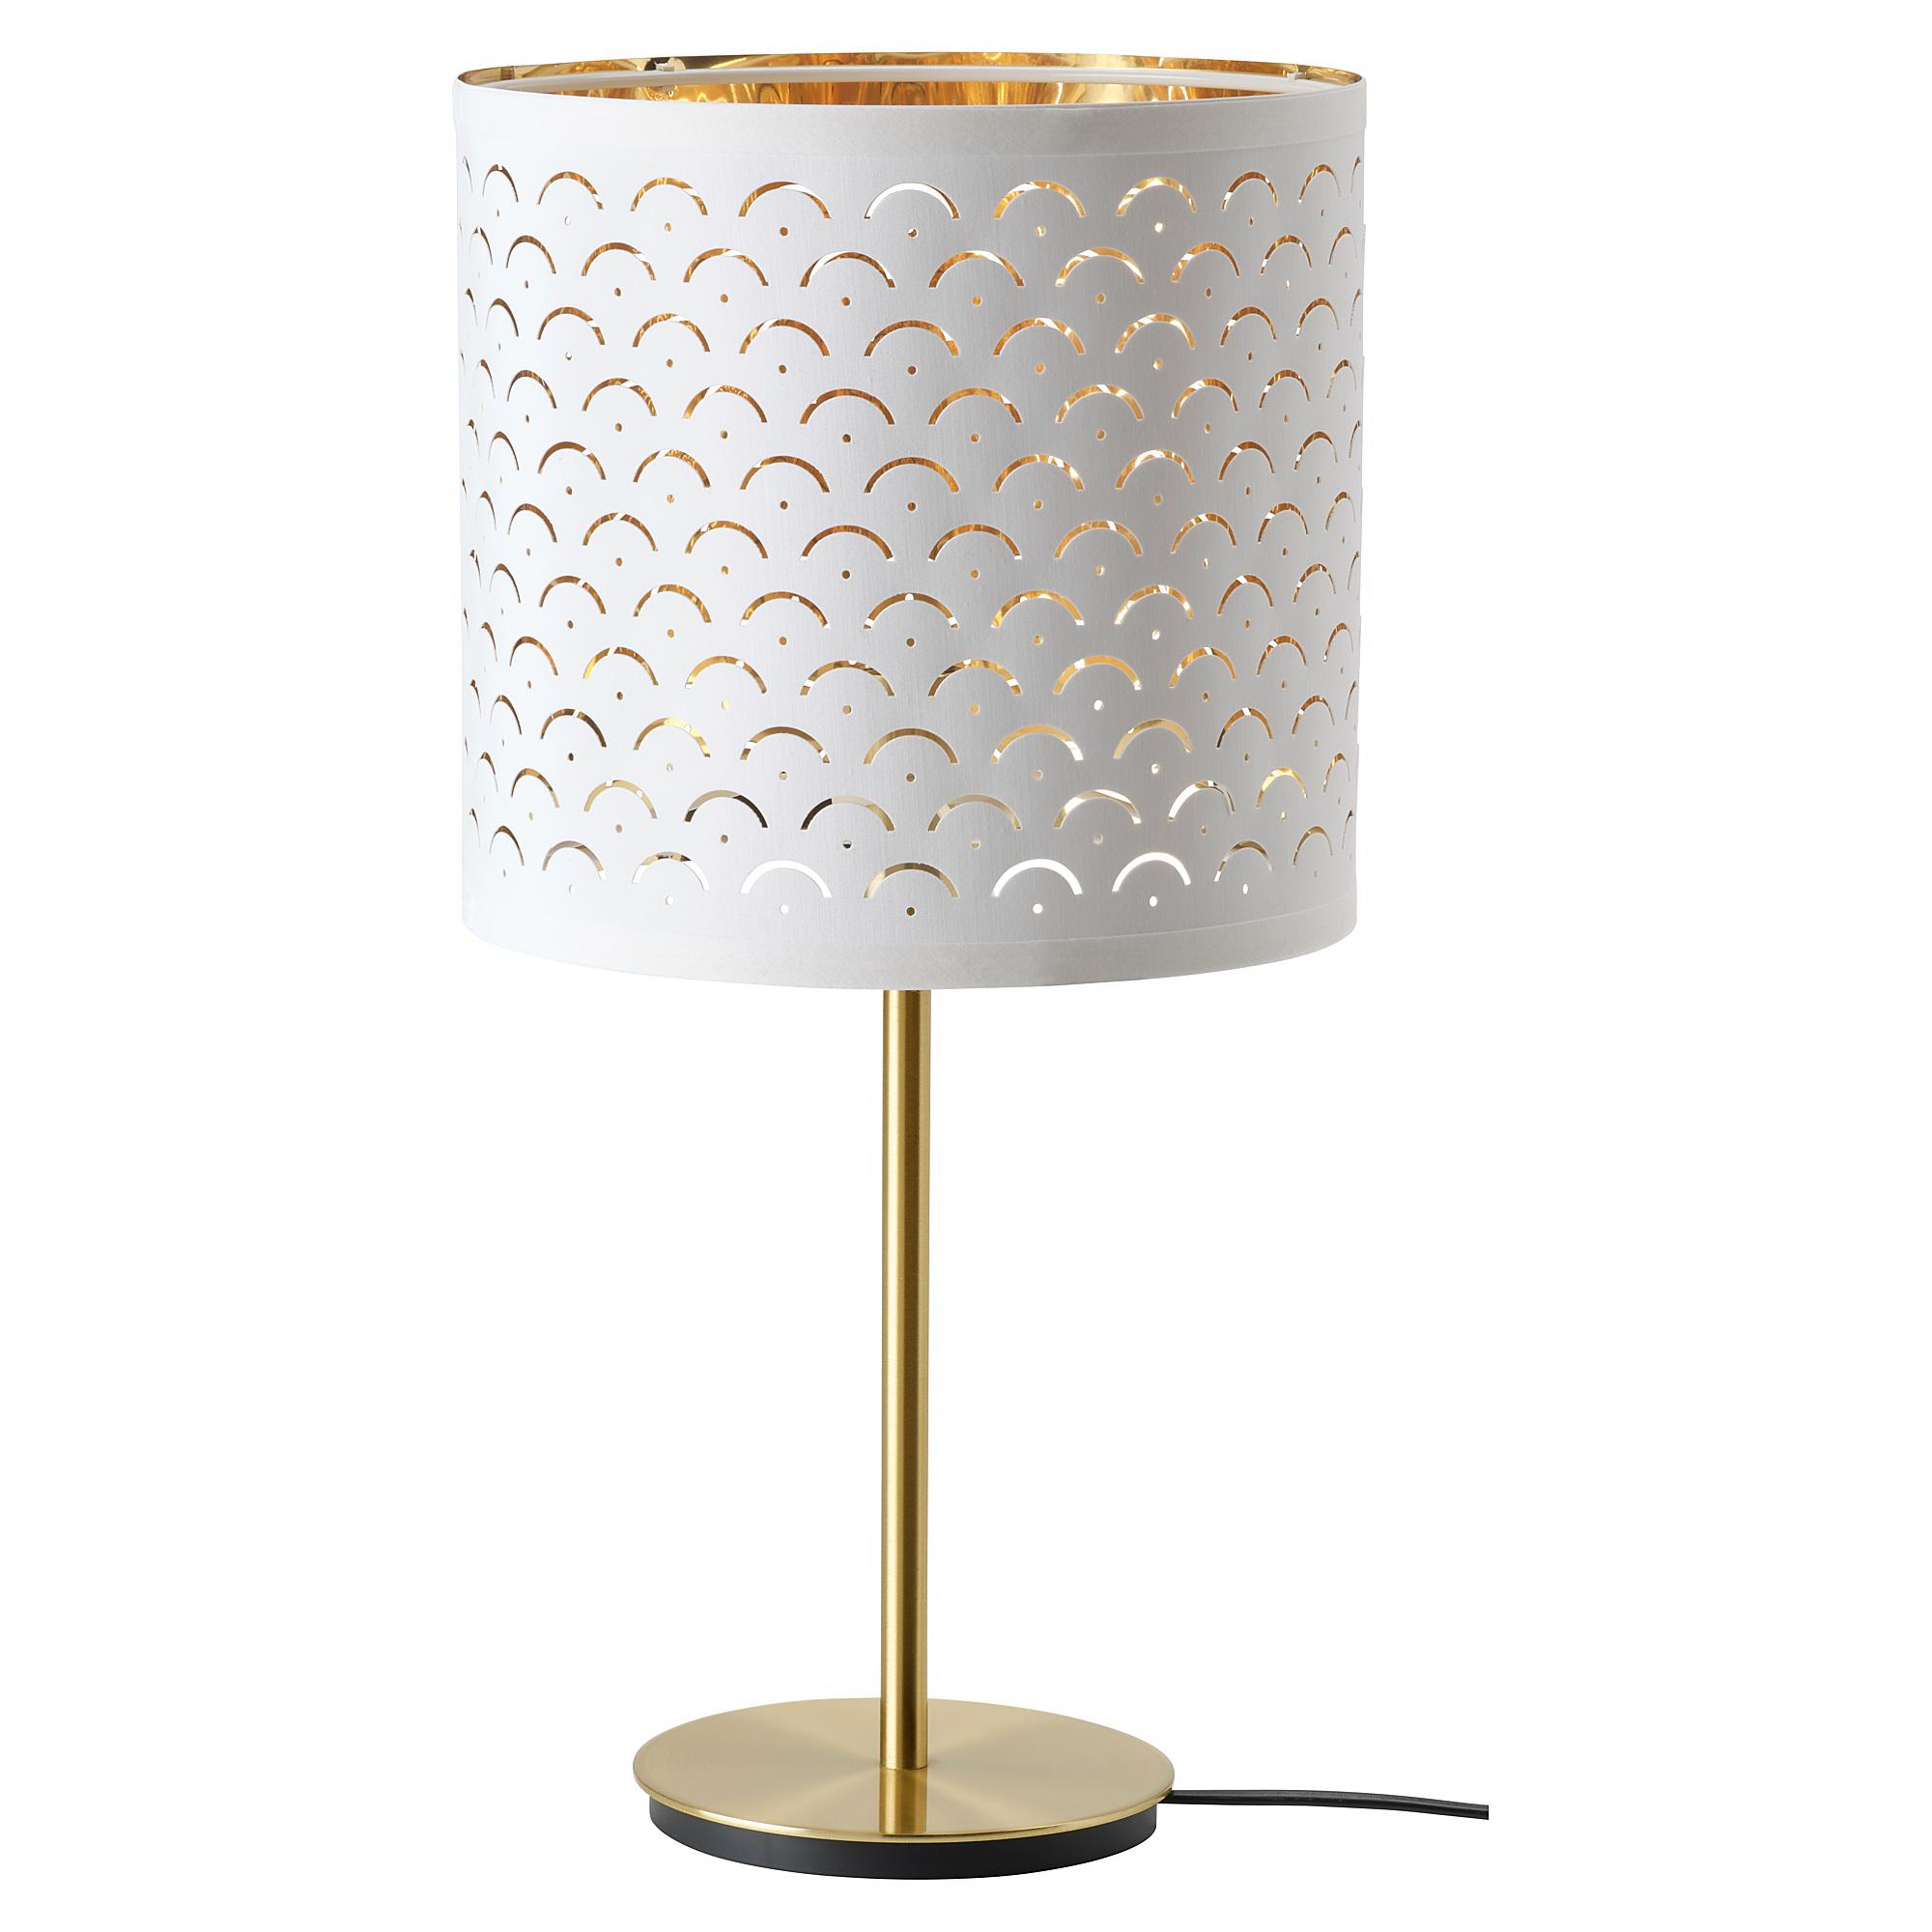 NYMÖ Pantalla para lámpara, blanco, color bronce, 24 cm IKEA